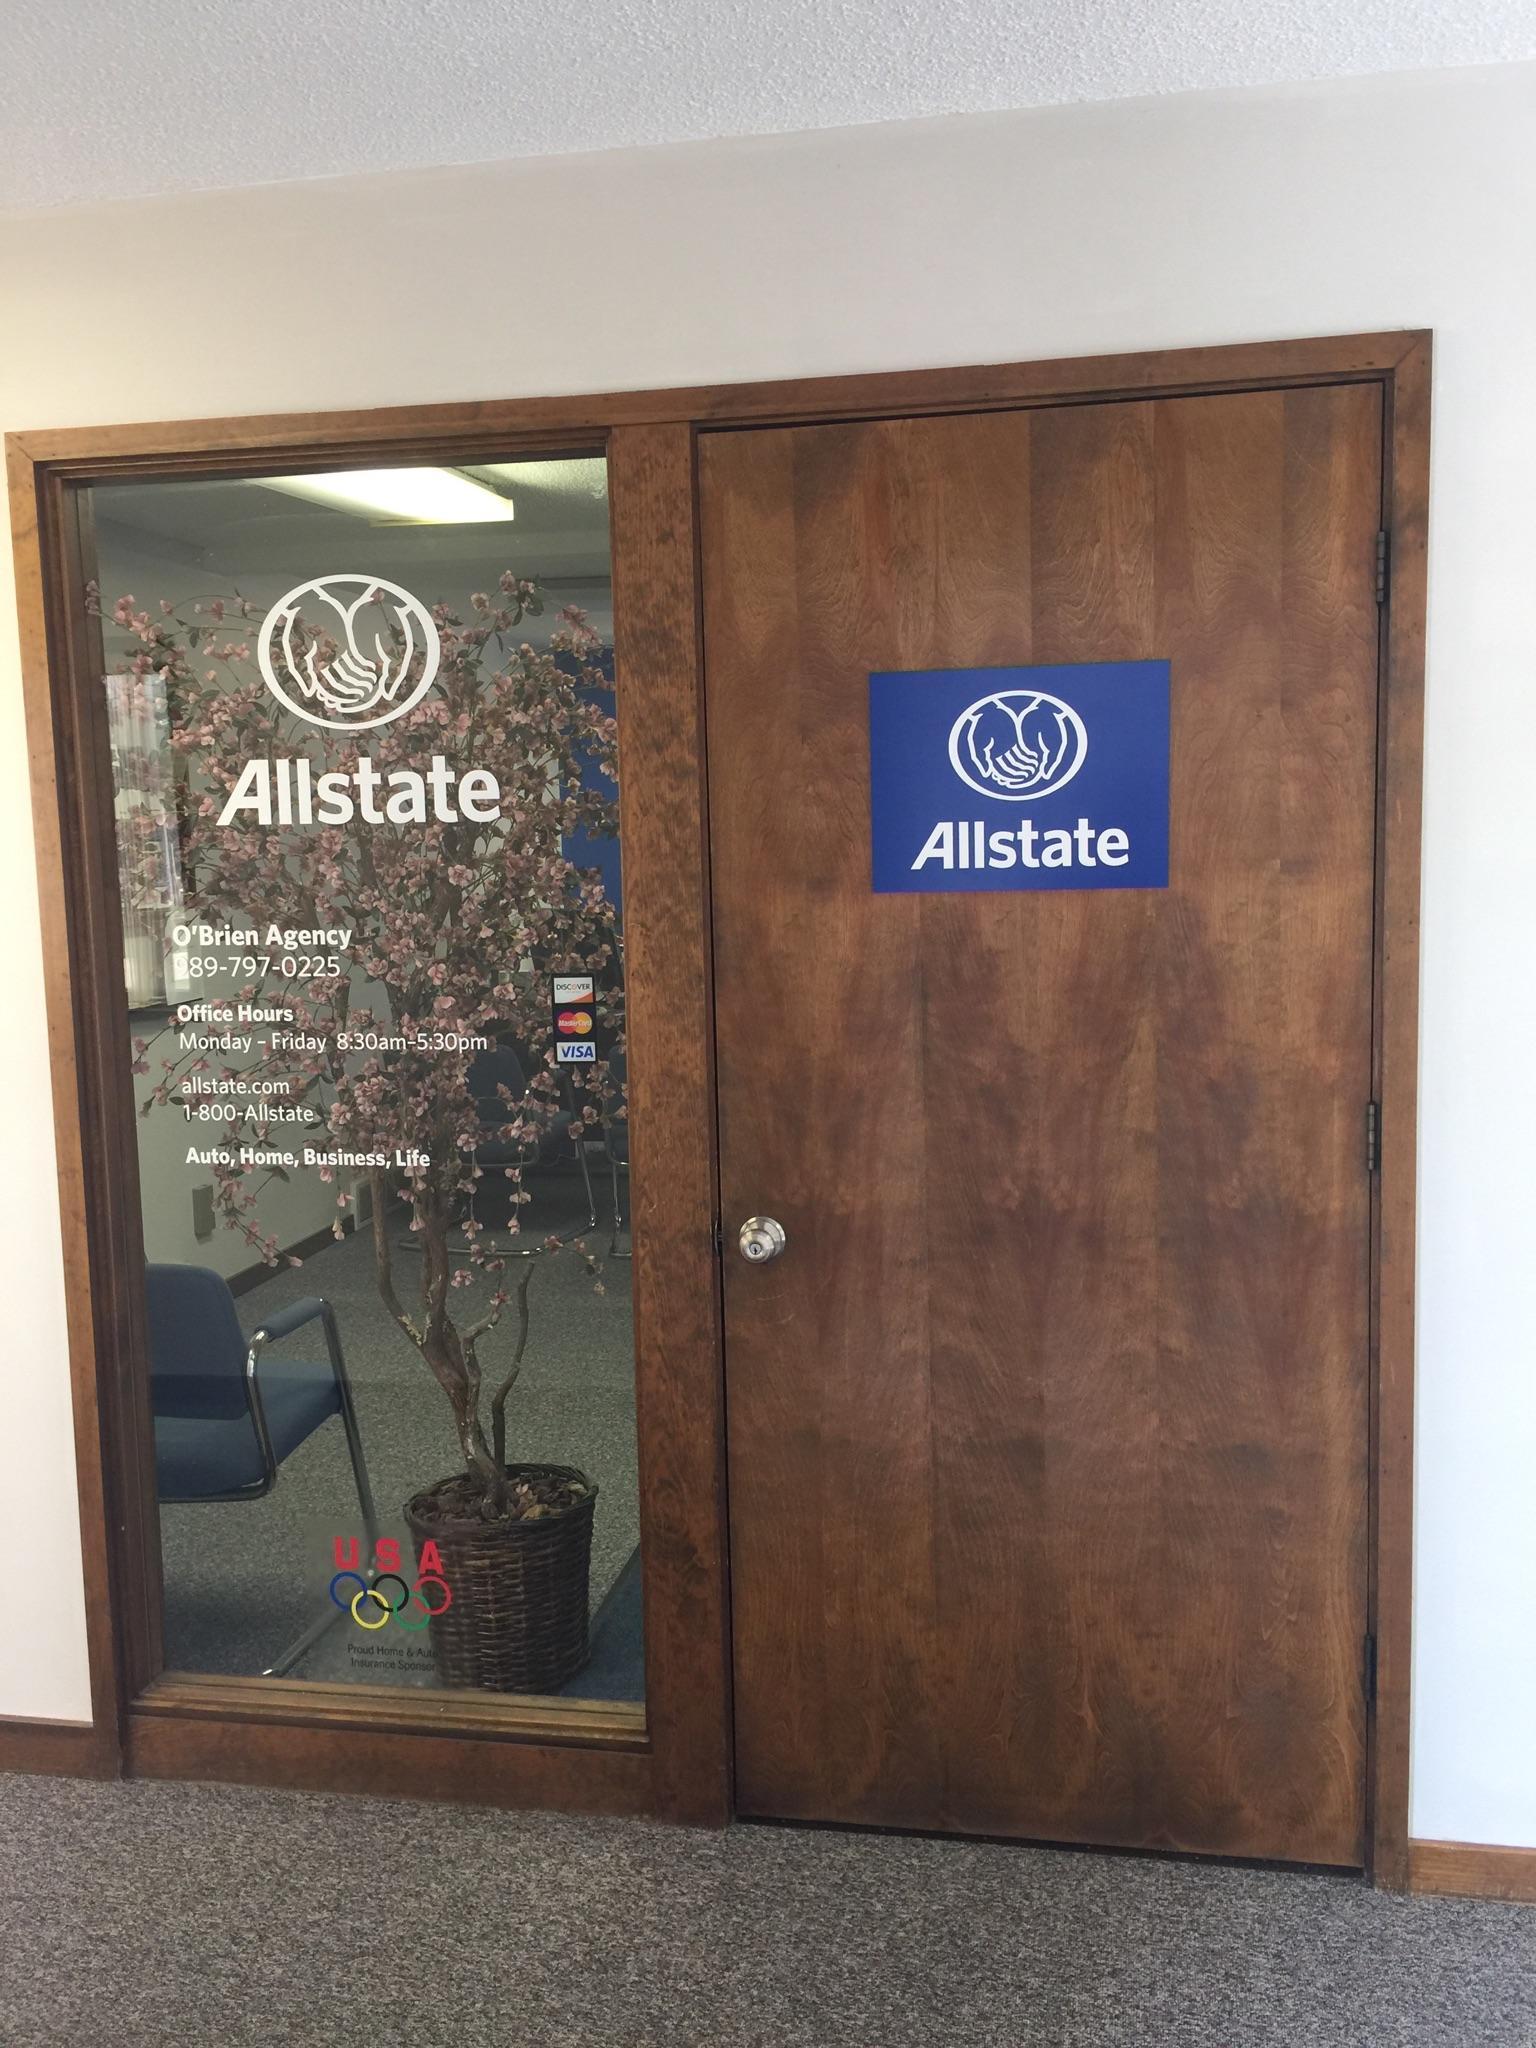 Allstate Insurance Agent: Debra OBrien image 1